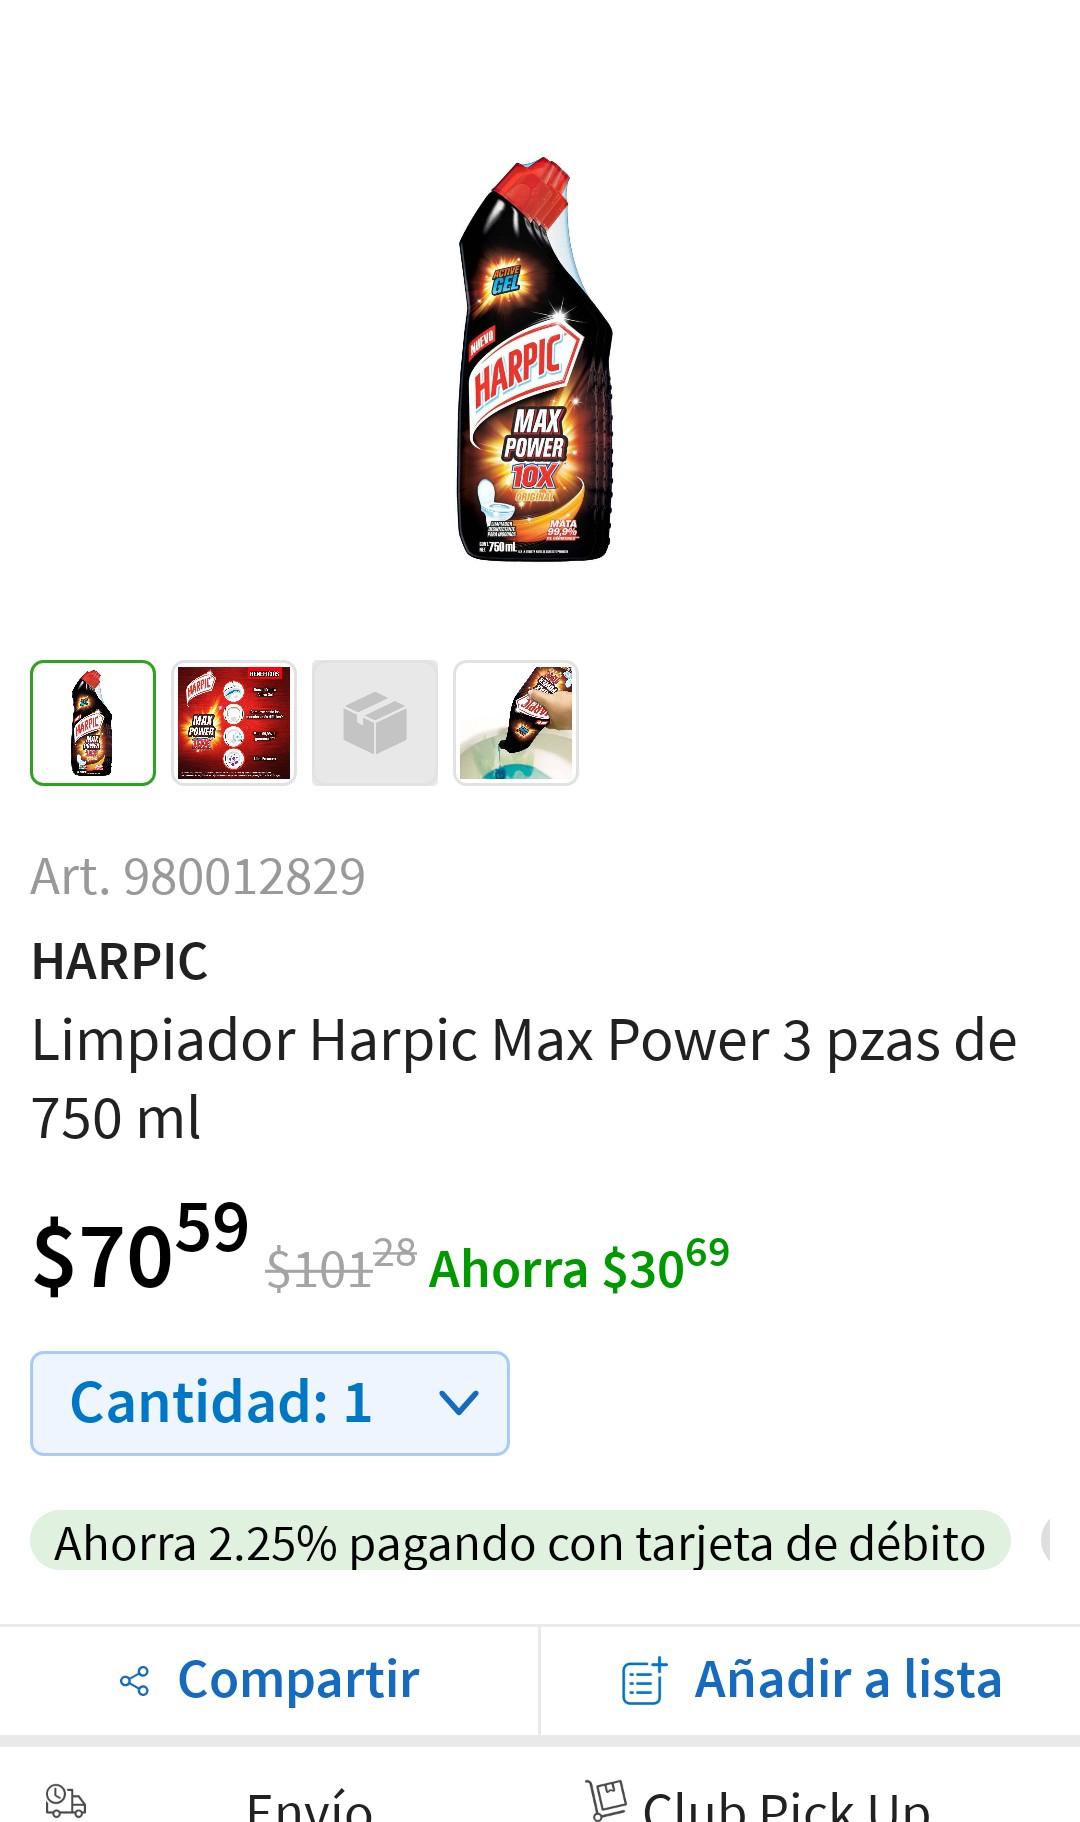 Sam's Club: HARPIC LIMPIADOR MAX POWER 3 PIEZAS 750 ml 3